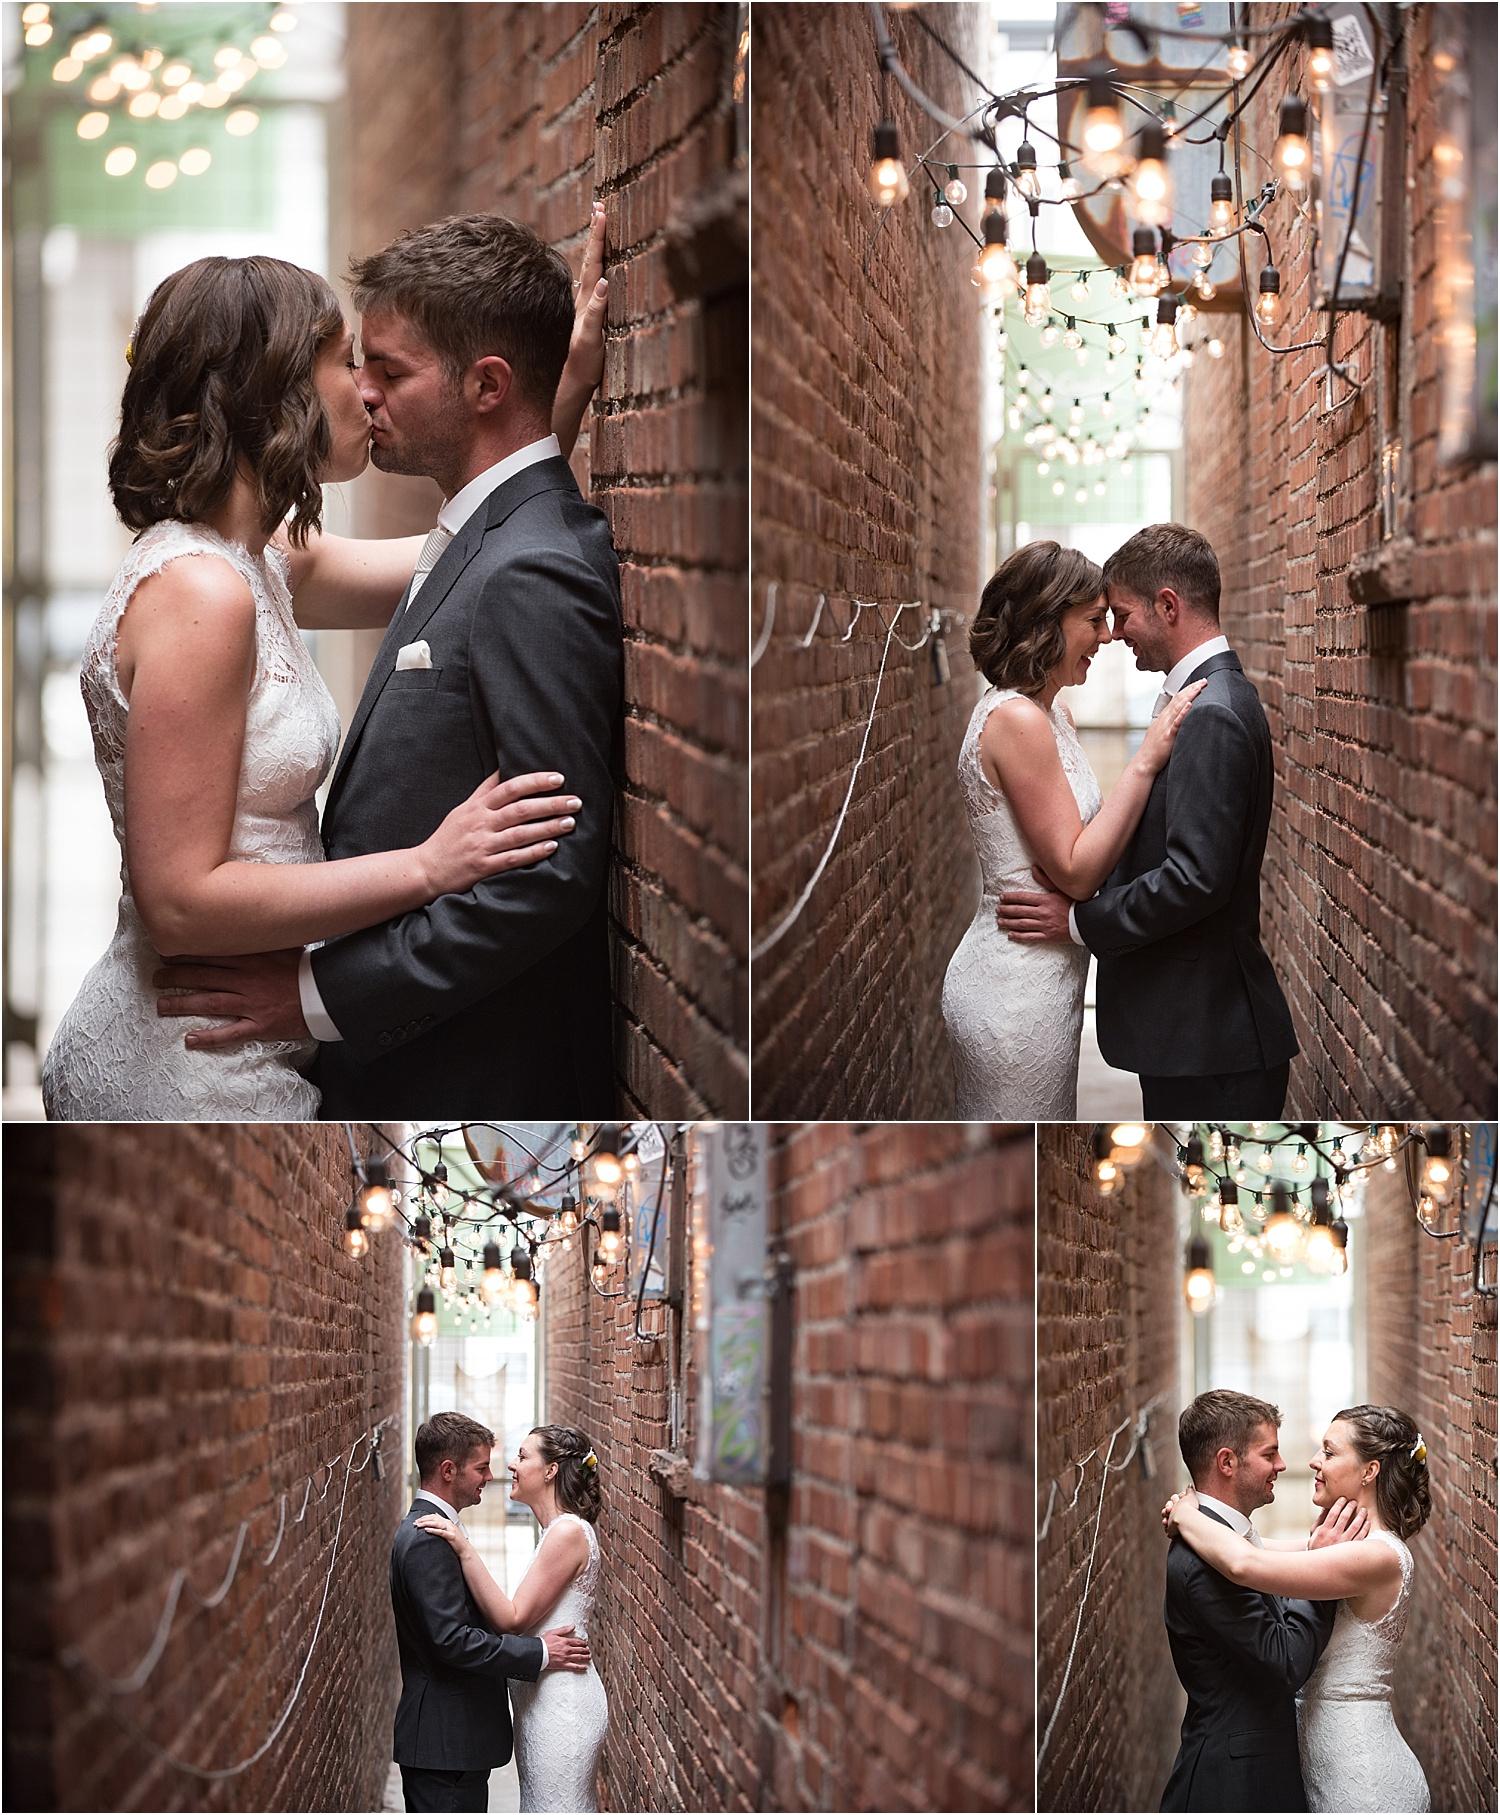 Denver_Wedding_Photography_Skylight_Urban_Venue_Modern_Bride_016.jpg